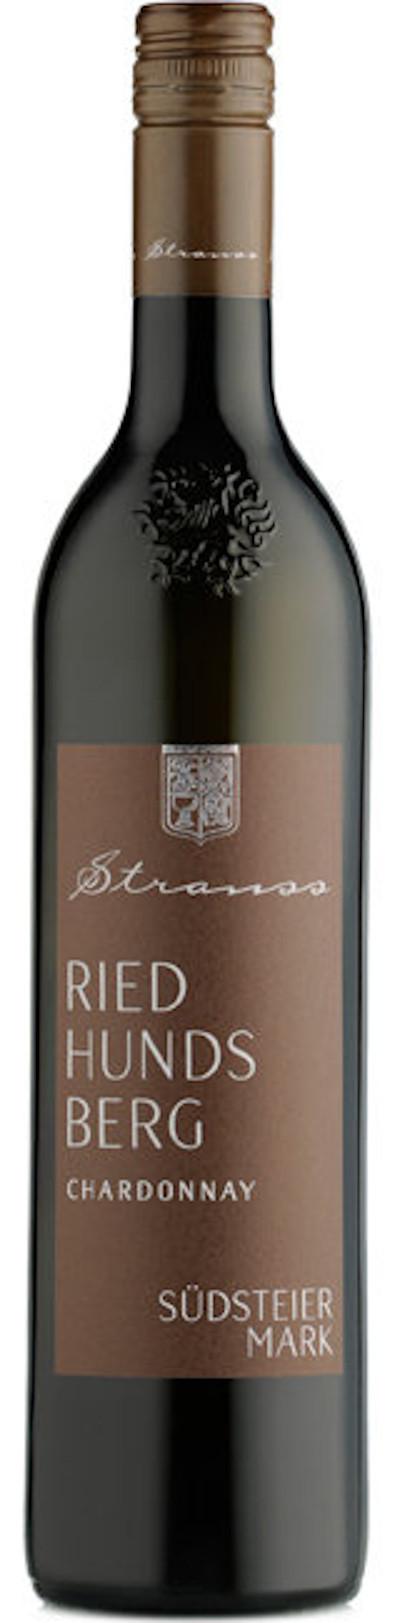 Strauss - Chardonnay Ried Hundsberg